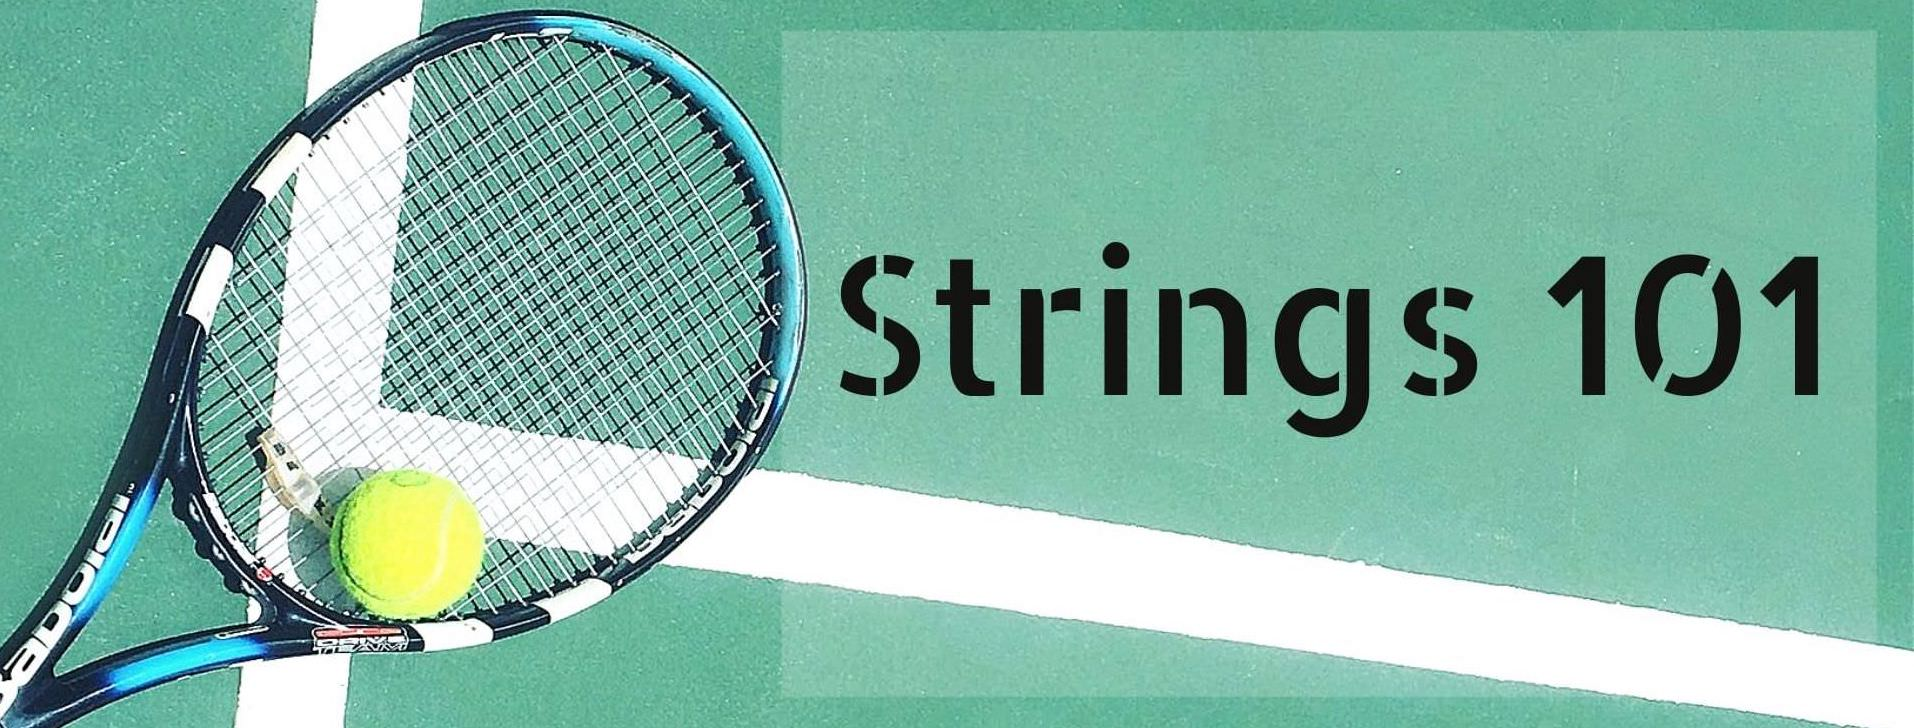 Strings Guide 101